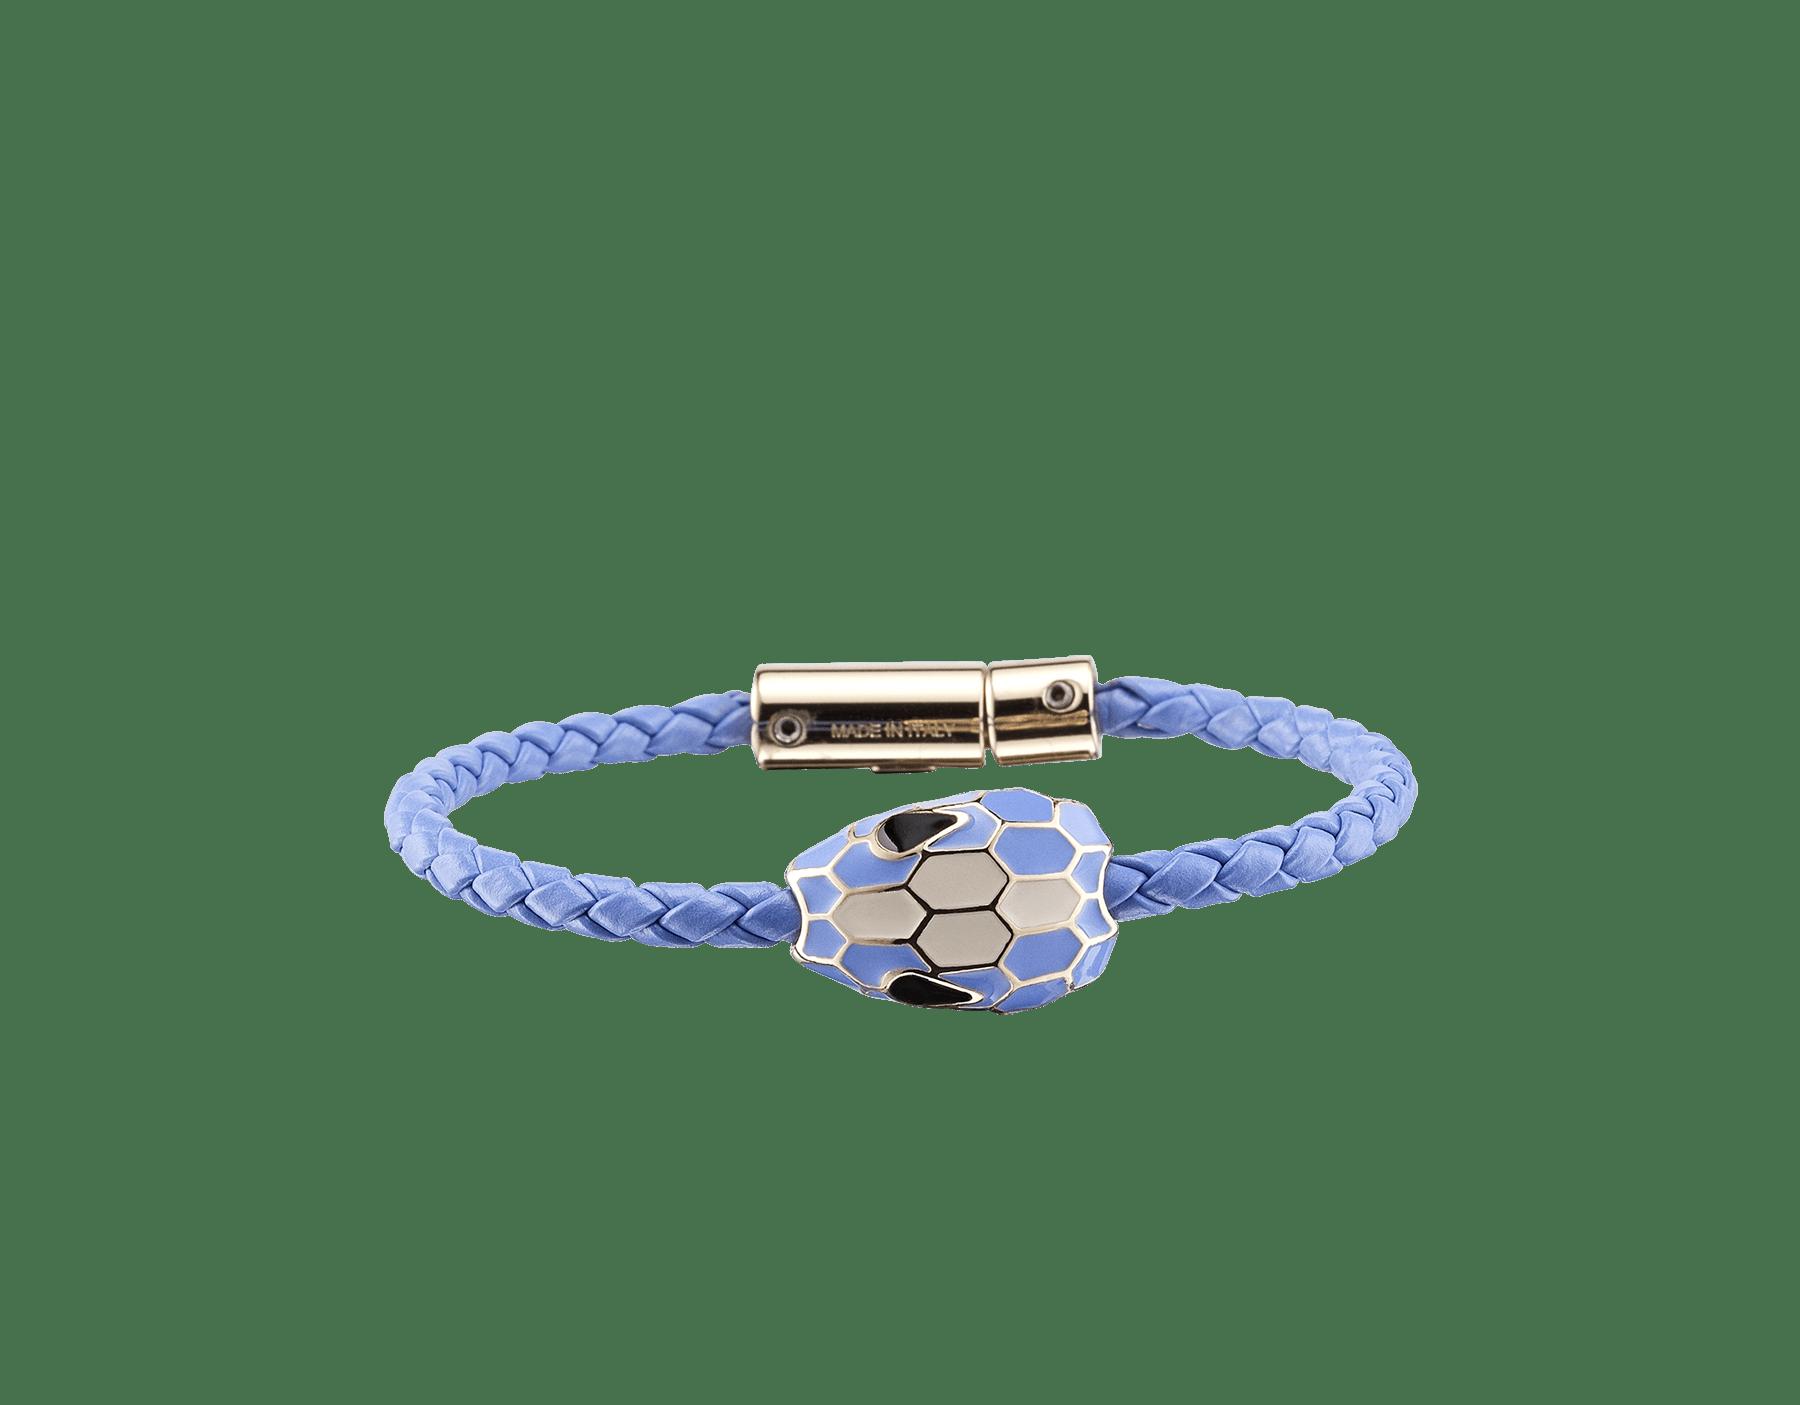 Serpenti Forever 手環,採用 Lavander Amethyst 紫丁香色編穗小牛皮和淡金色黃銅蛇身鍊帶,迷人的蛇頭吊飾飾以 Lavander Amethyst 紫丁香色和淨白瑪瑙色琺瑯,蛇眼飾以黑色琺瑯,磁性扣頭。 SerpBraid-WCL-LA image 1